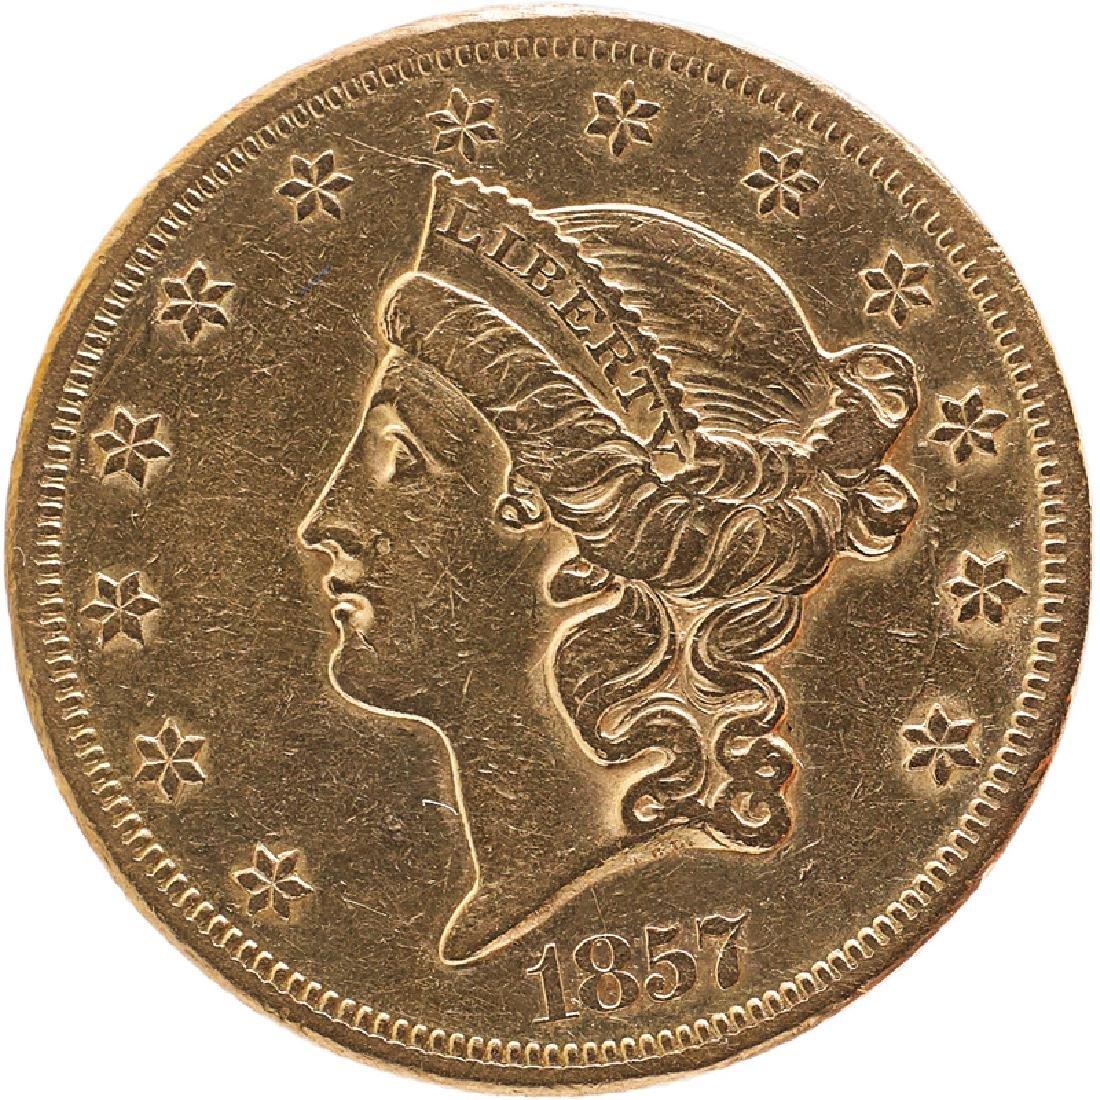 U.S. 1857-S LIBERTY $20 GOLD COIN